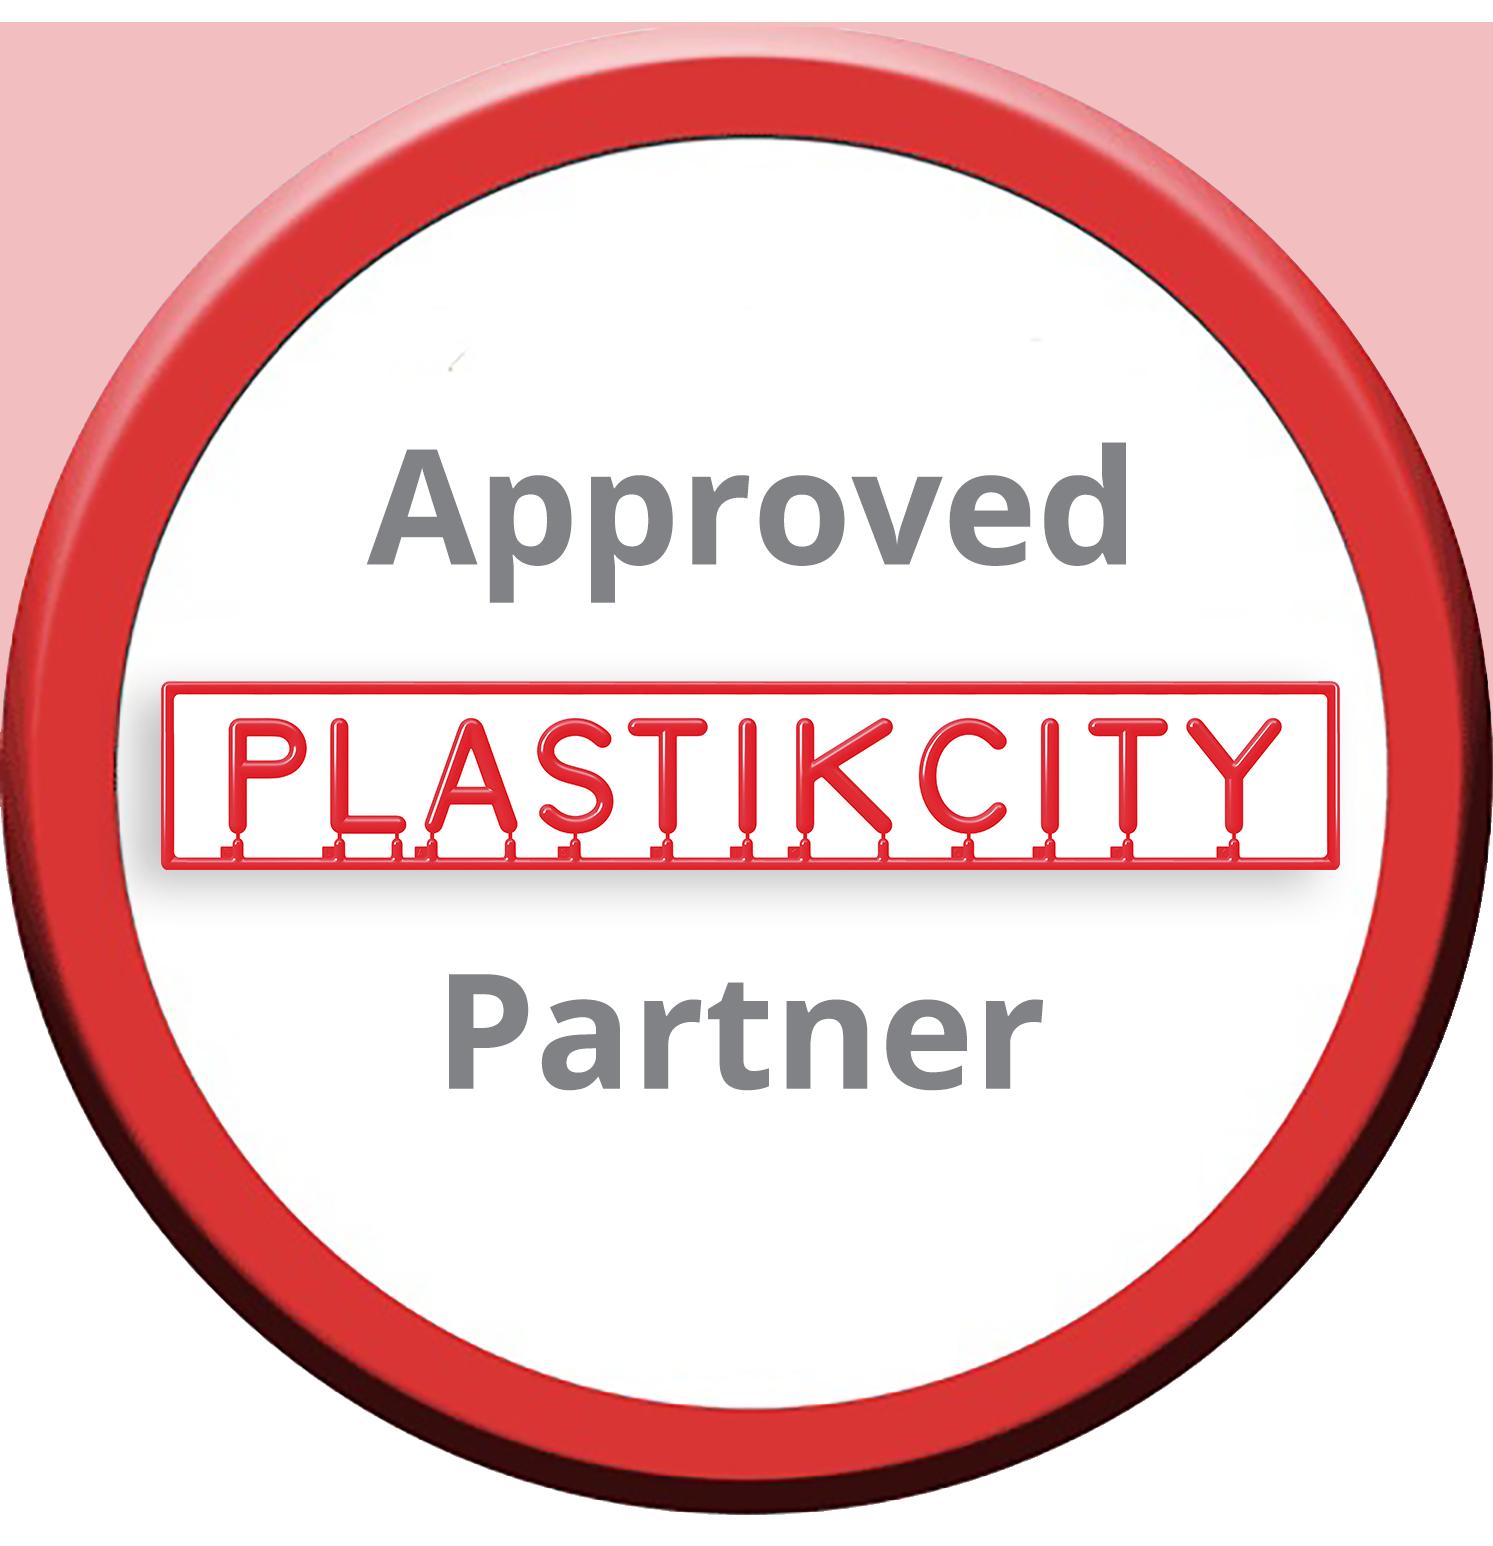 PlastikCity